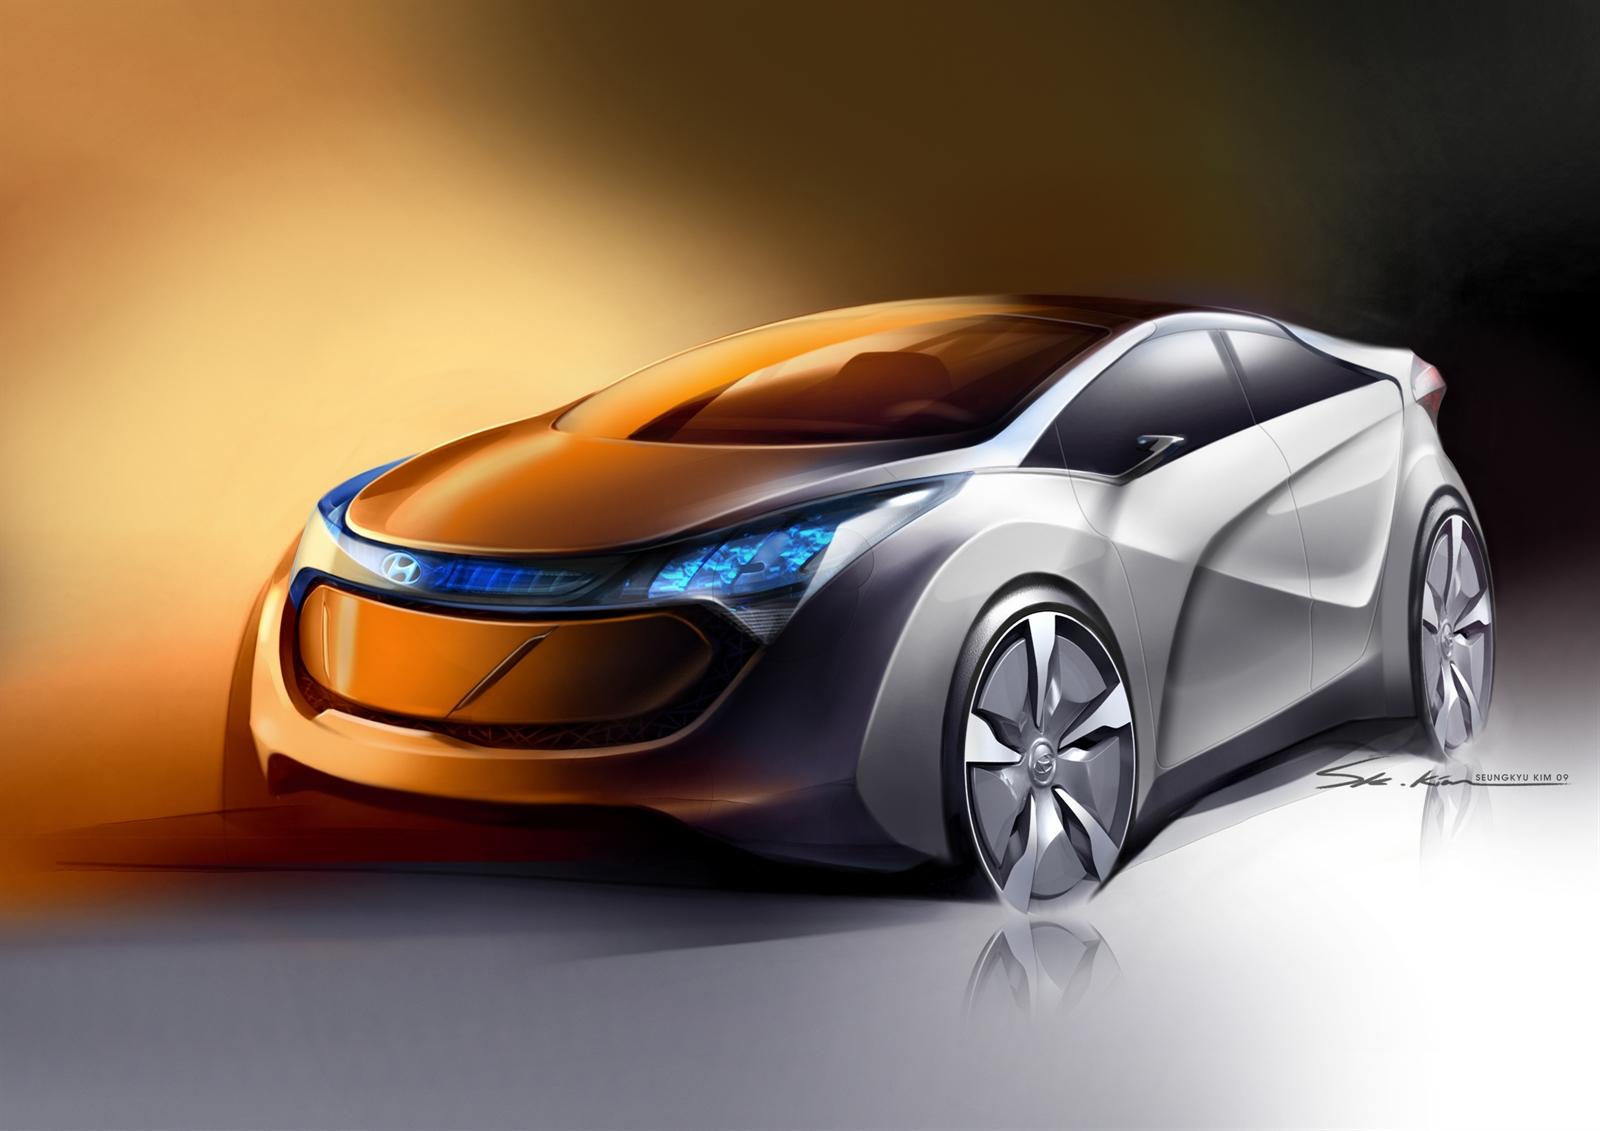 Hyundai S Future Cars Line Up Until 2018 The Korean Car Blog